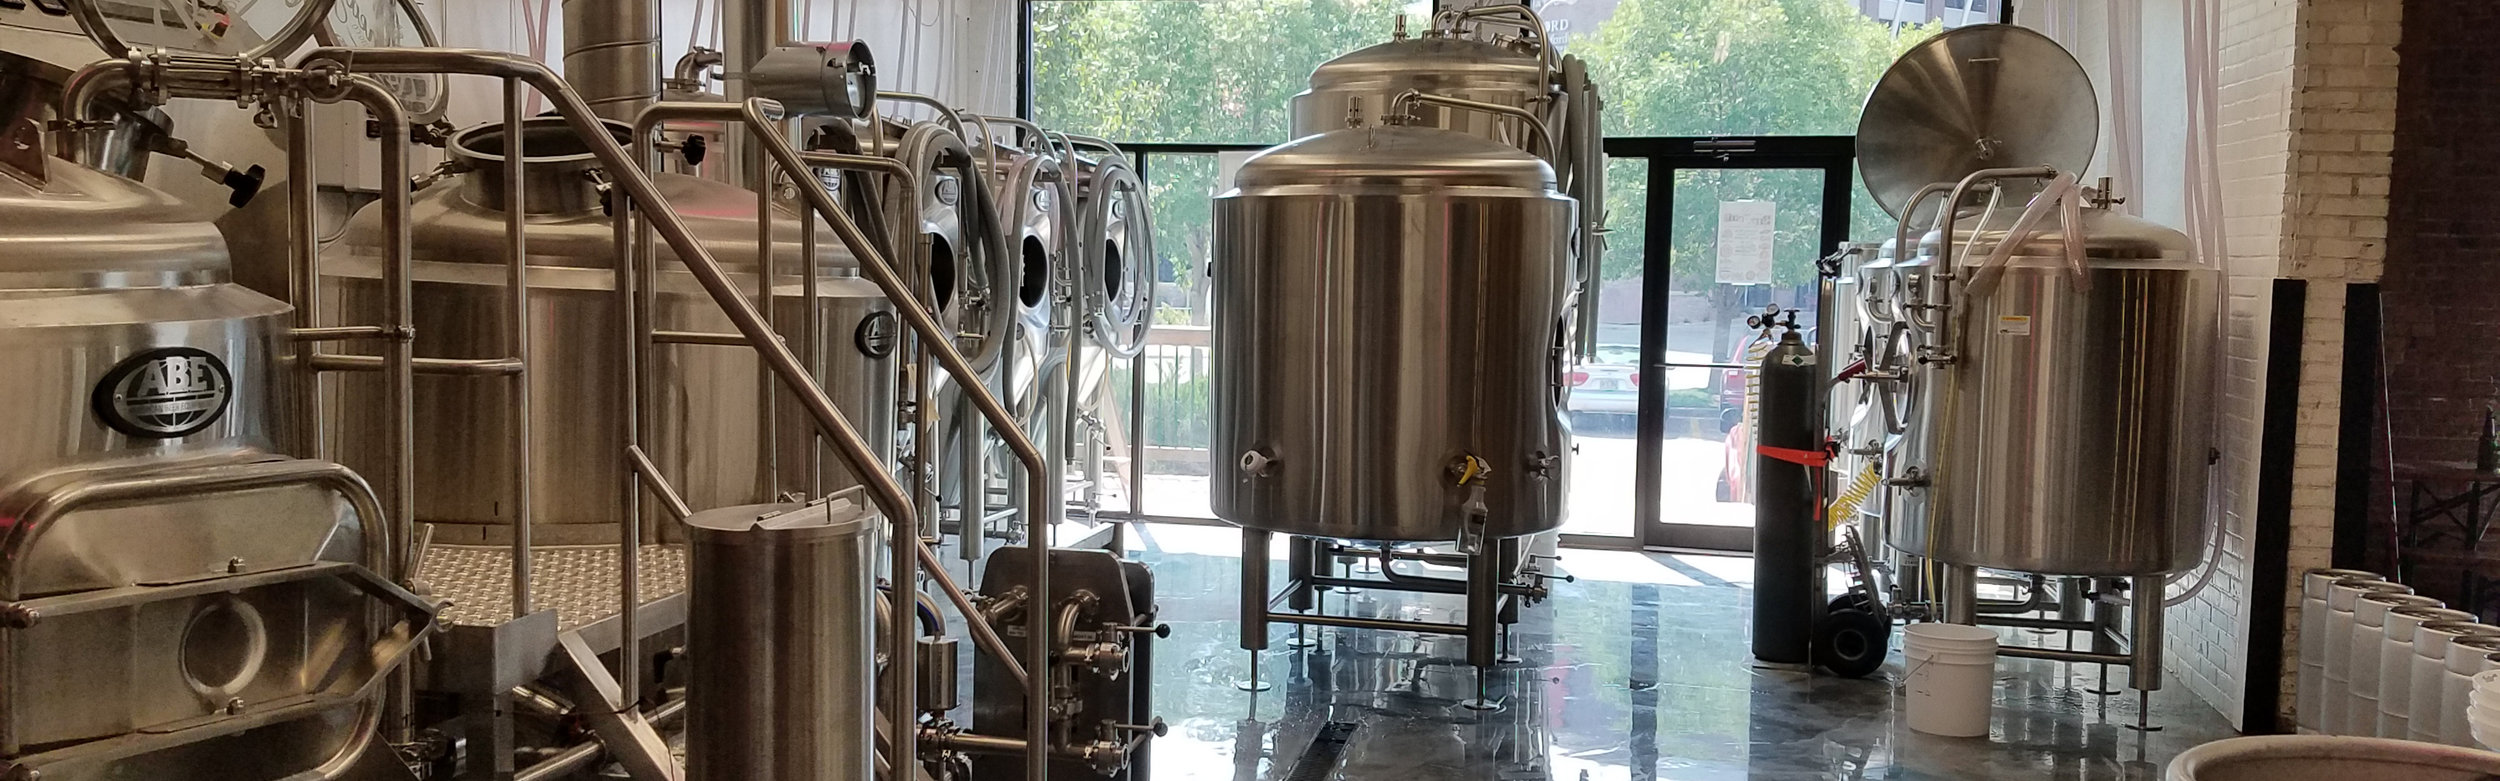 brewery_tours2.jpg